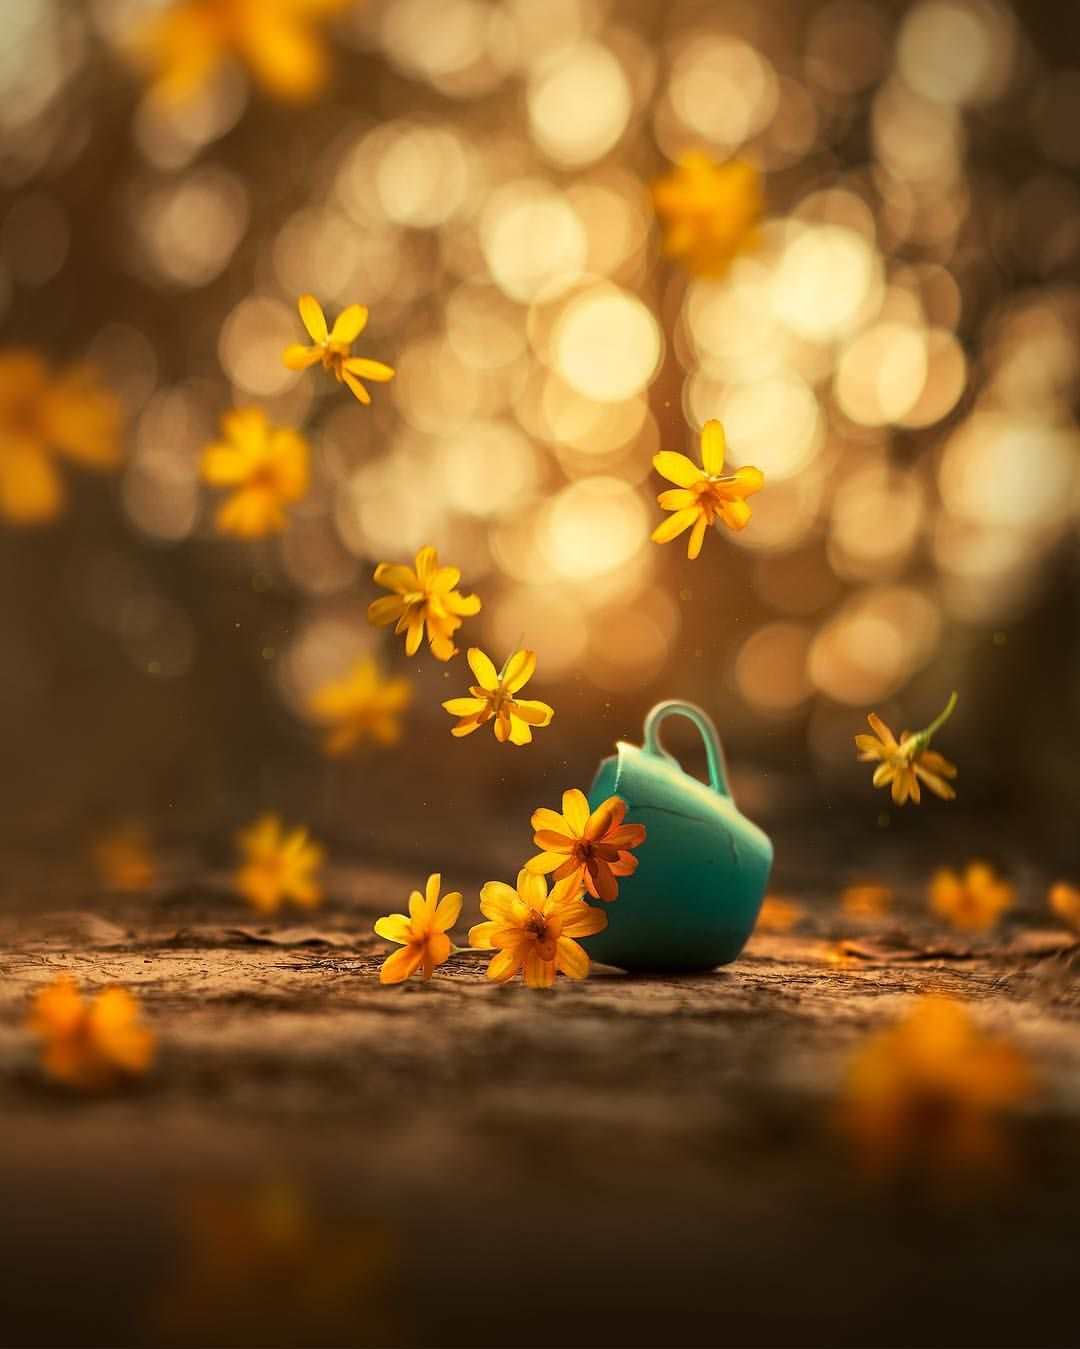 Whimsical And Dreamlike Still Life Photography By Ashraful Arefin Di 2020 Pemandangan Anime Pemandangan Fotografi Pemandangan